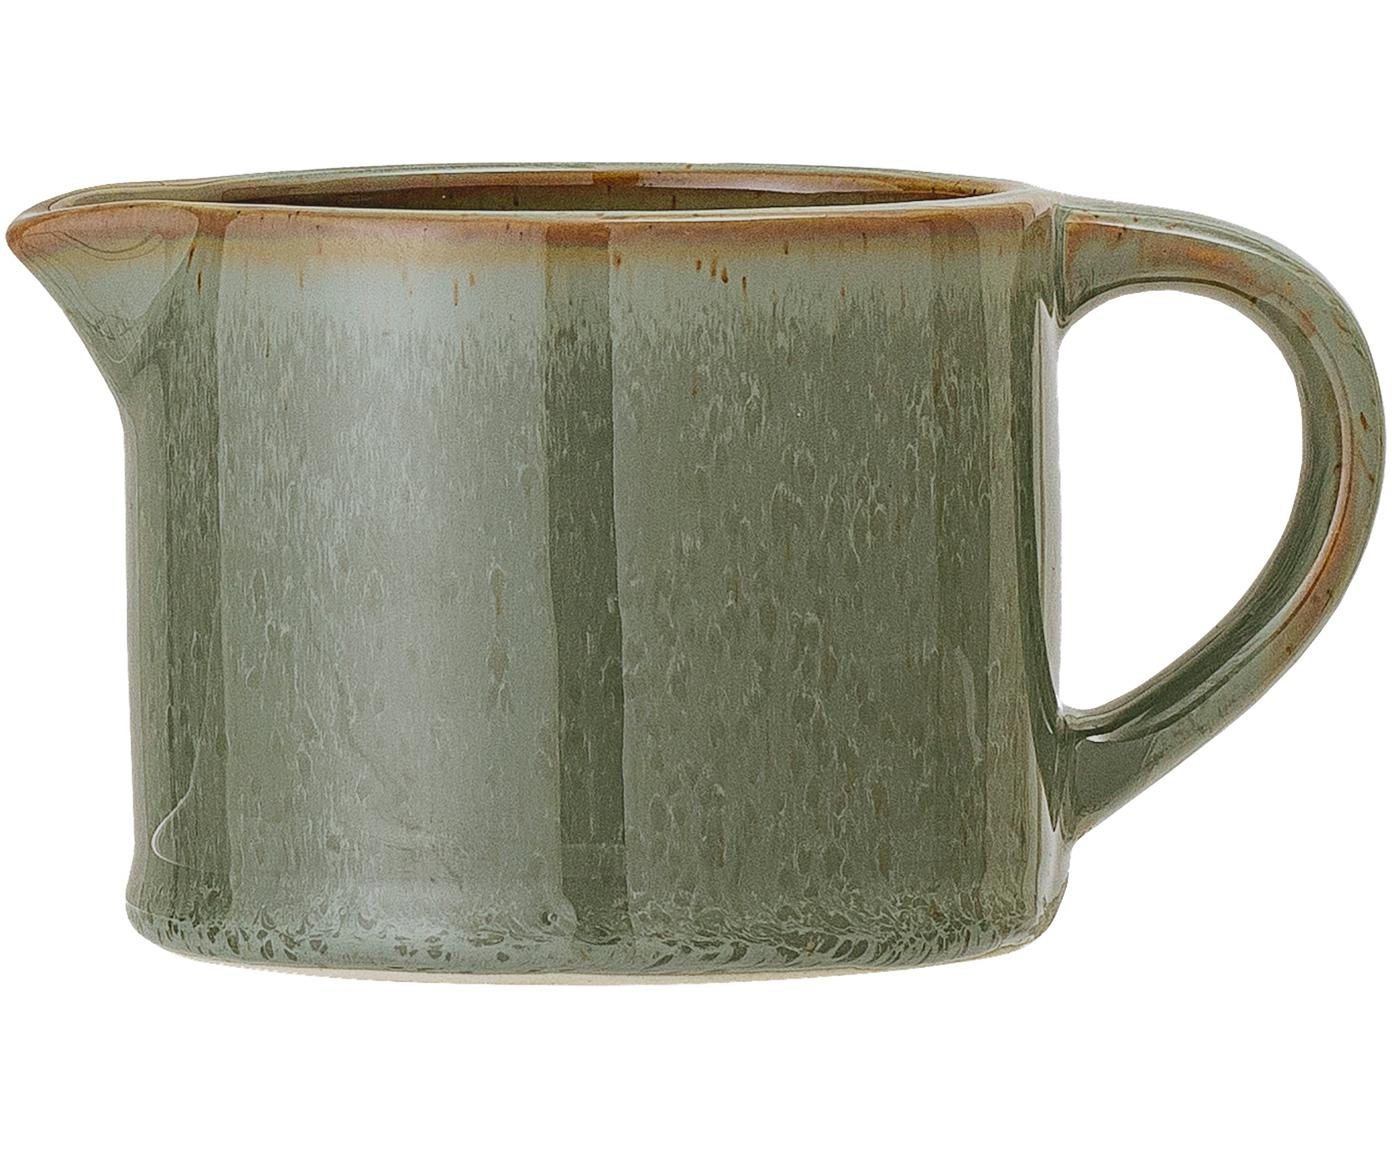 Lechera artesanal Pixie, Gres, Verde, tonos marrones, Ø 9 x Al 7 cm